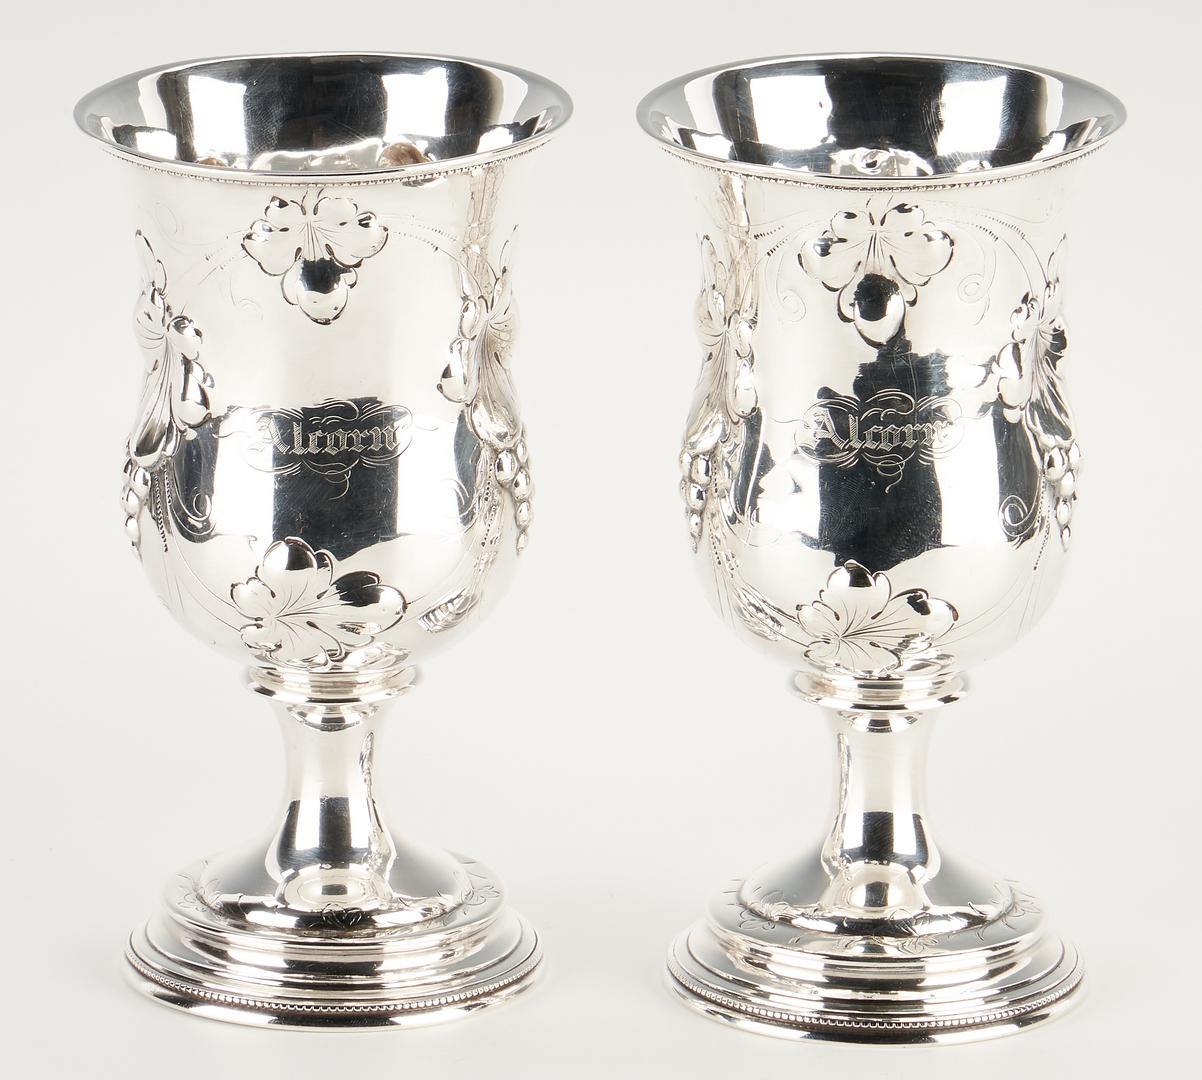 Lot 110: Mississippi Gov. Alcorn Coin Silver Pitcher & Goblets